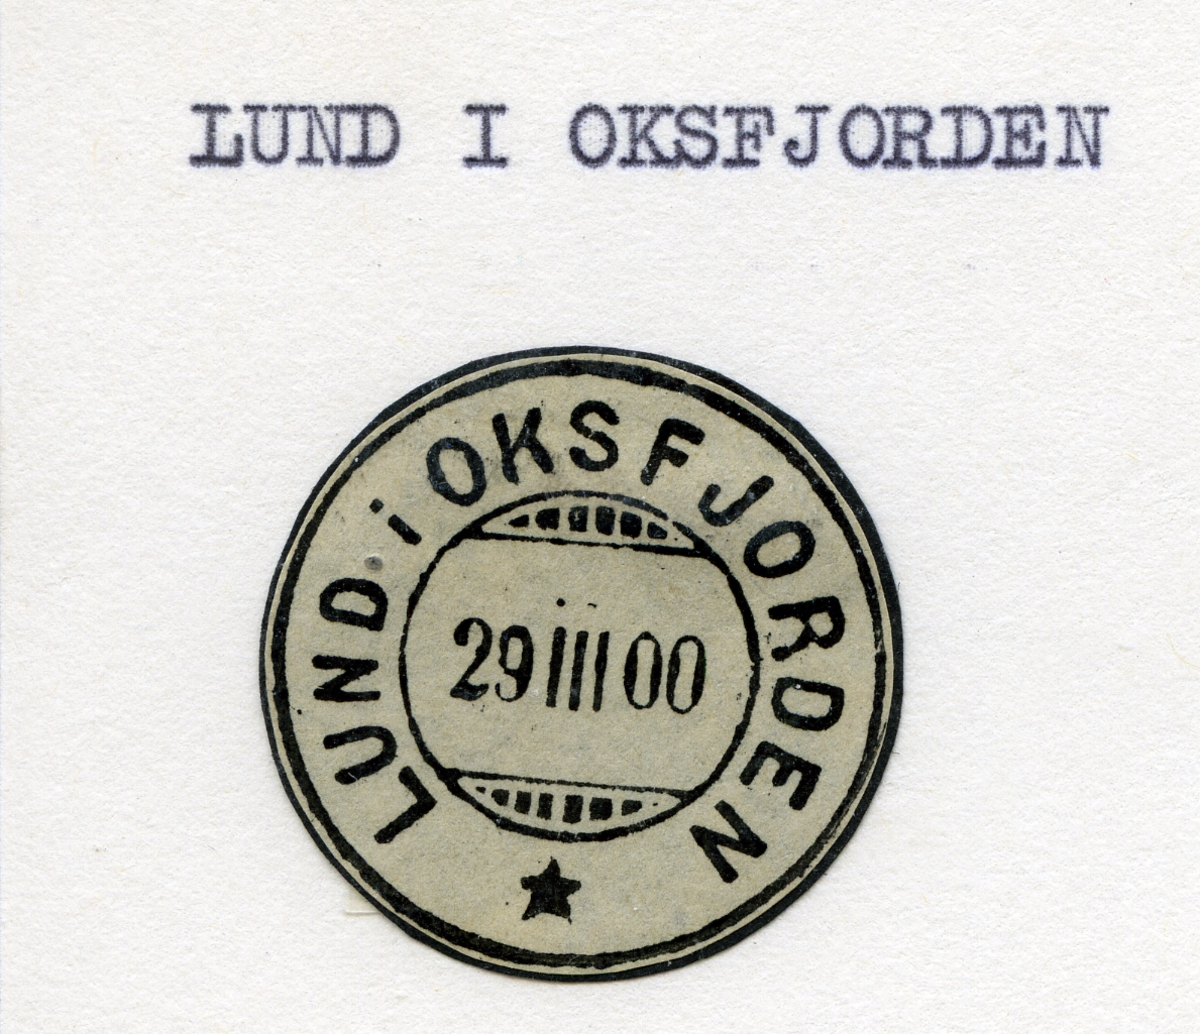 Stempelkatalog, Lund i Oksfjorden